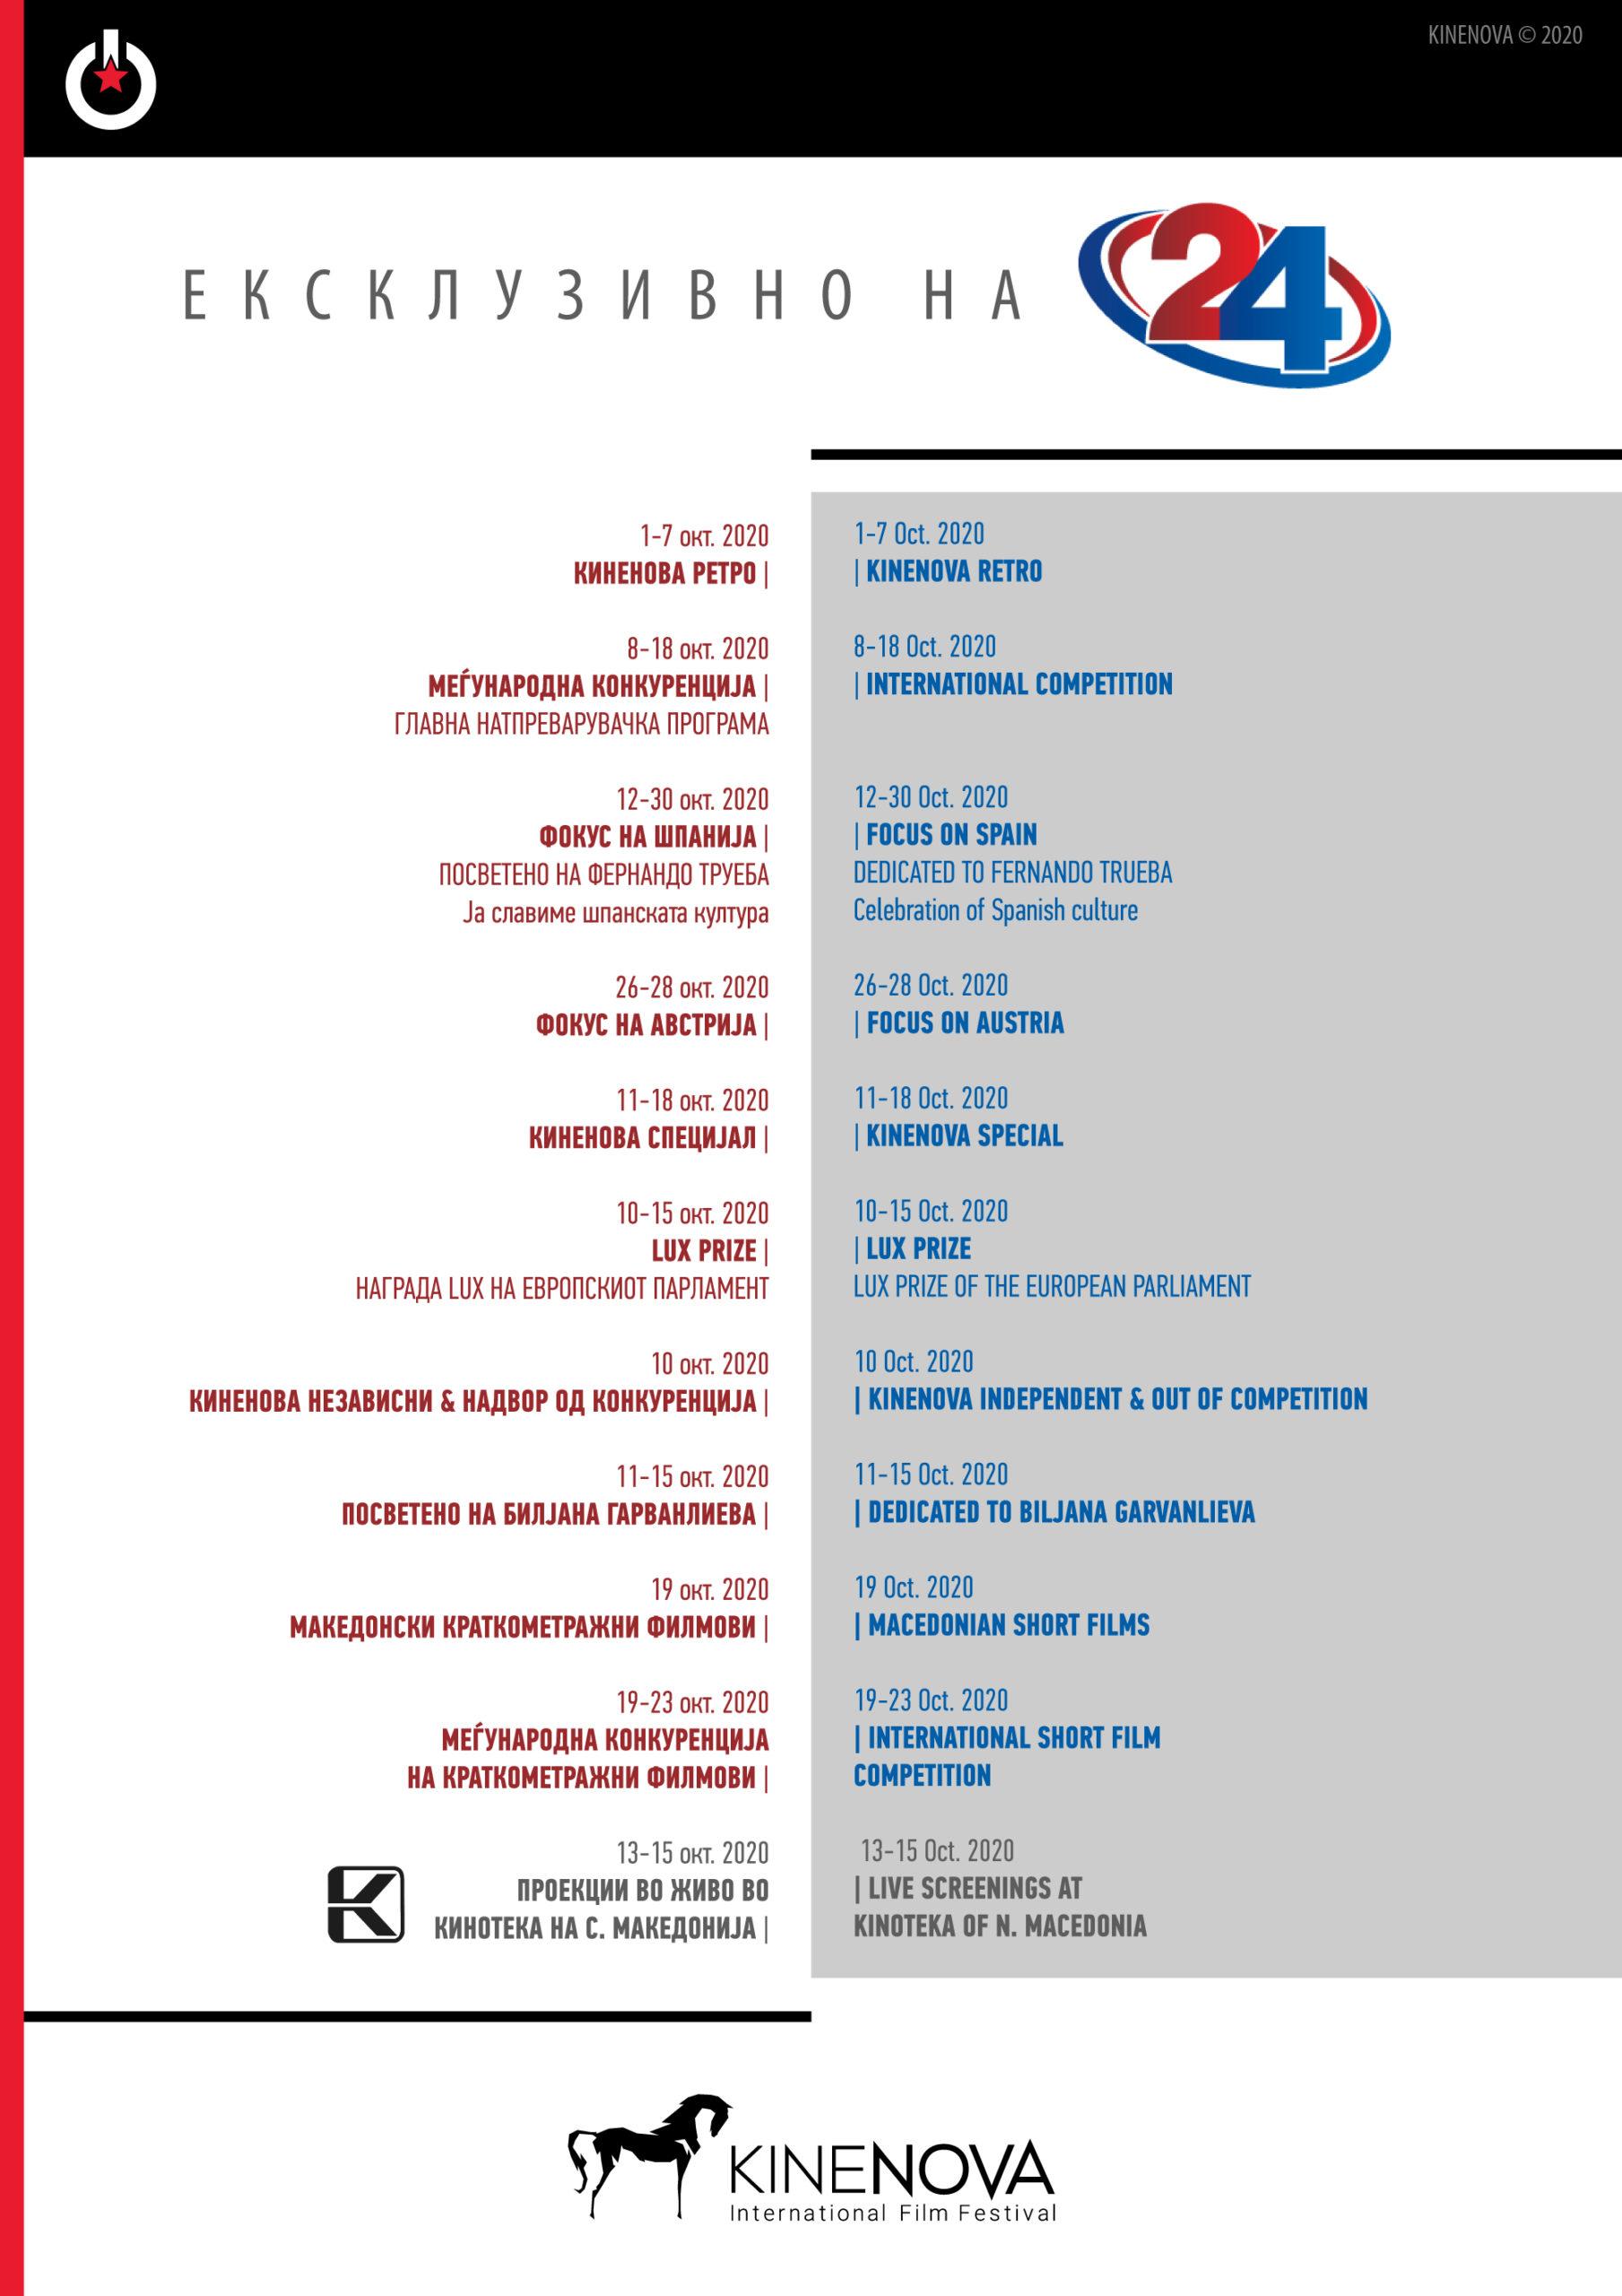 KATEGORII-RASPORED_KINENOVA-2020-01102020